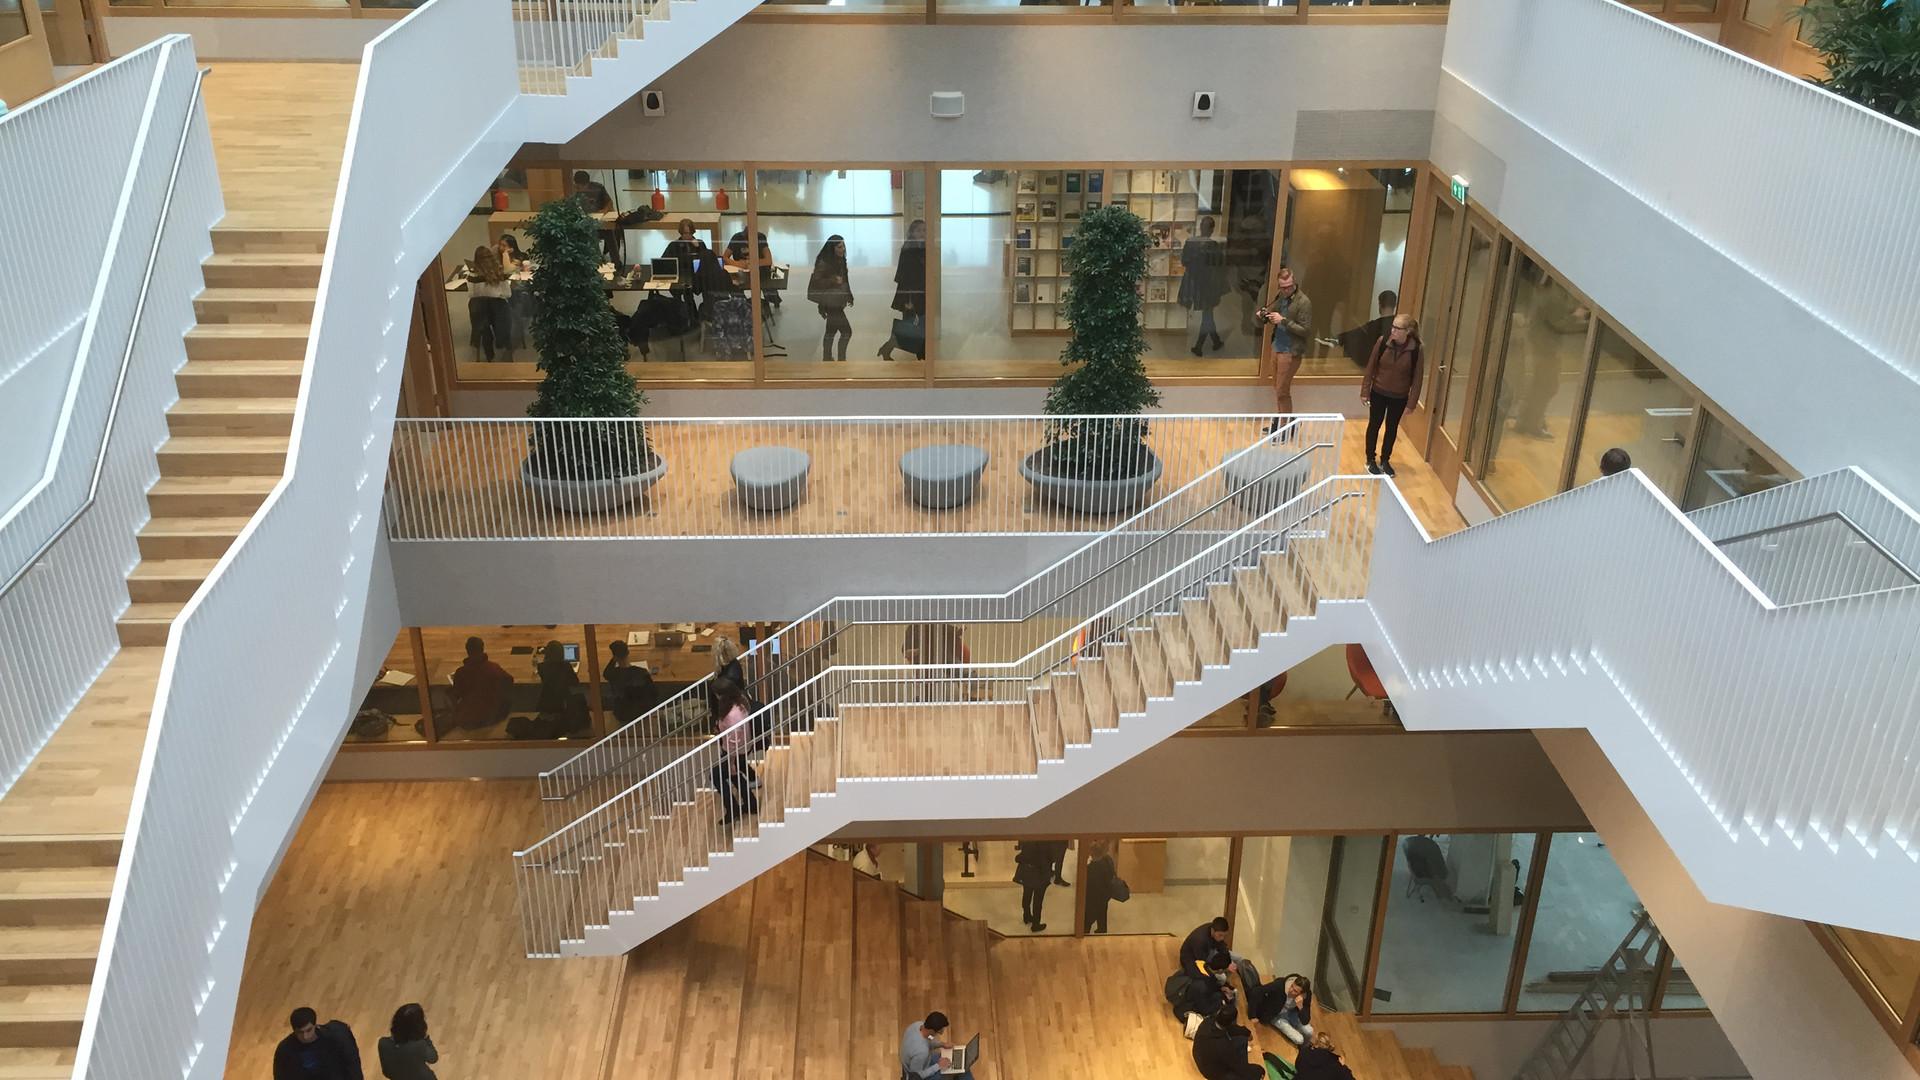 rotterdam school of management.jpg